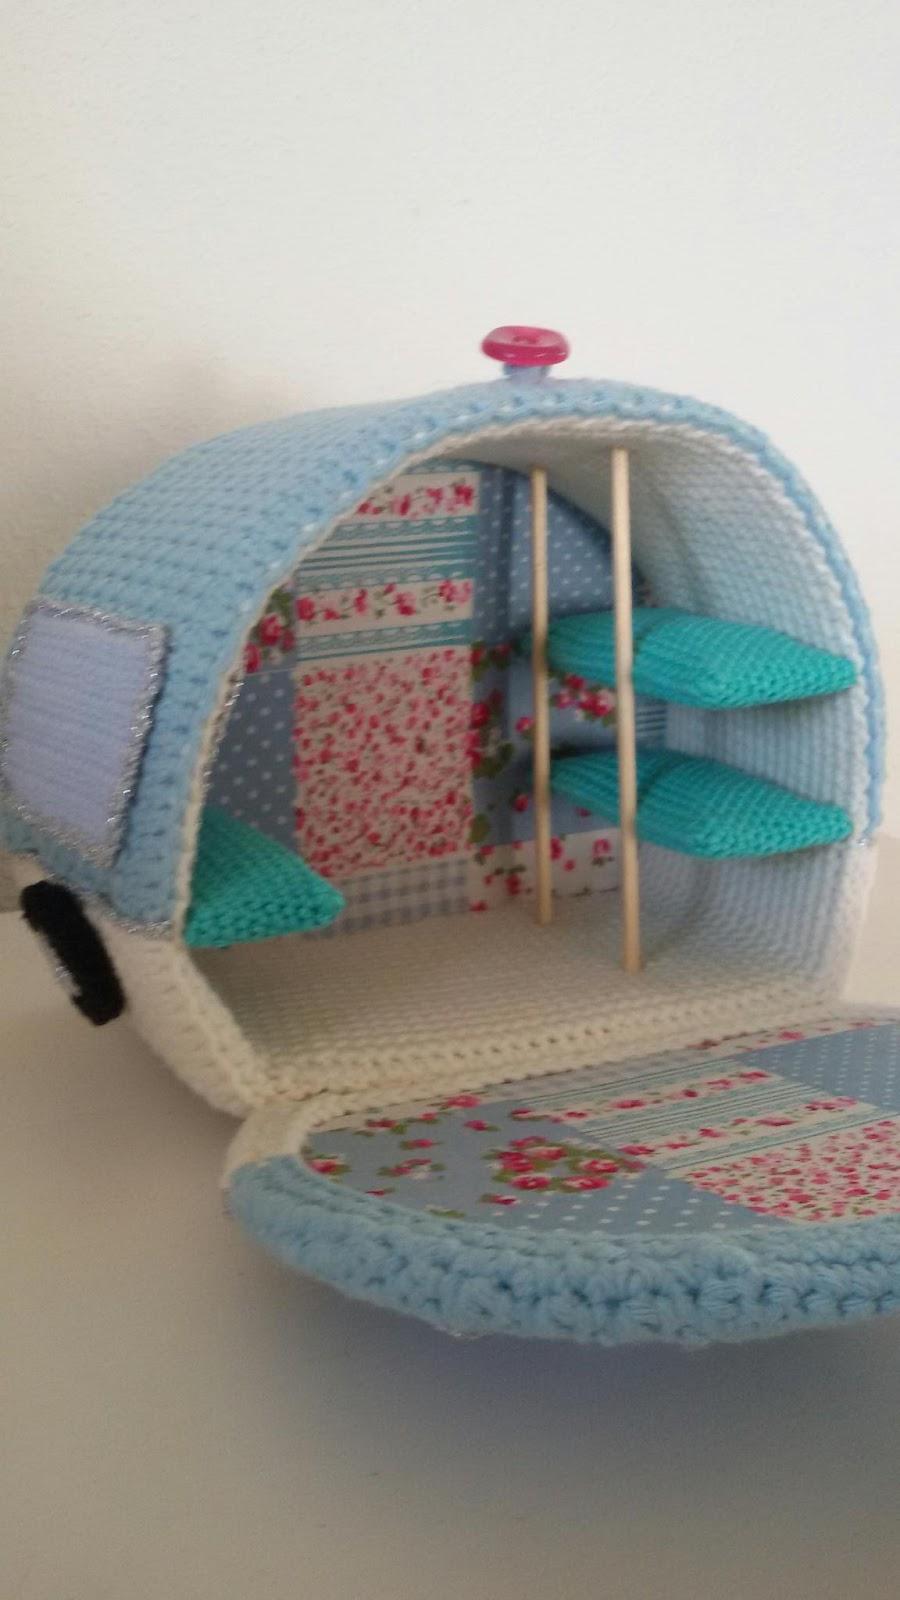 Handgemaakte Hebbedingetjes Caravan Haken Met Kate Bruning